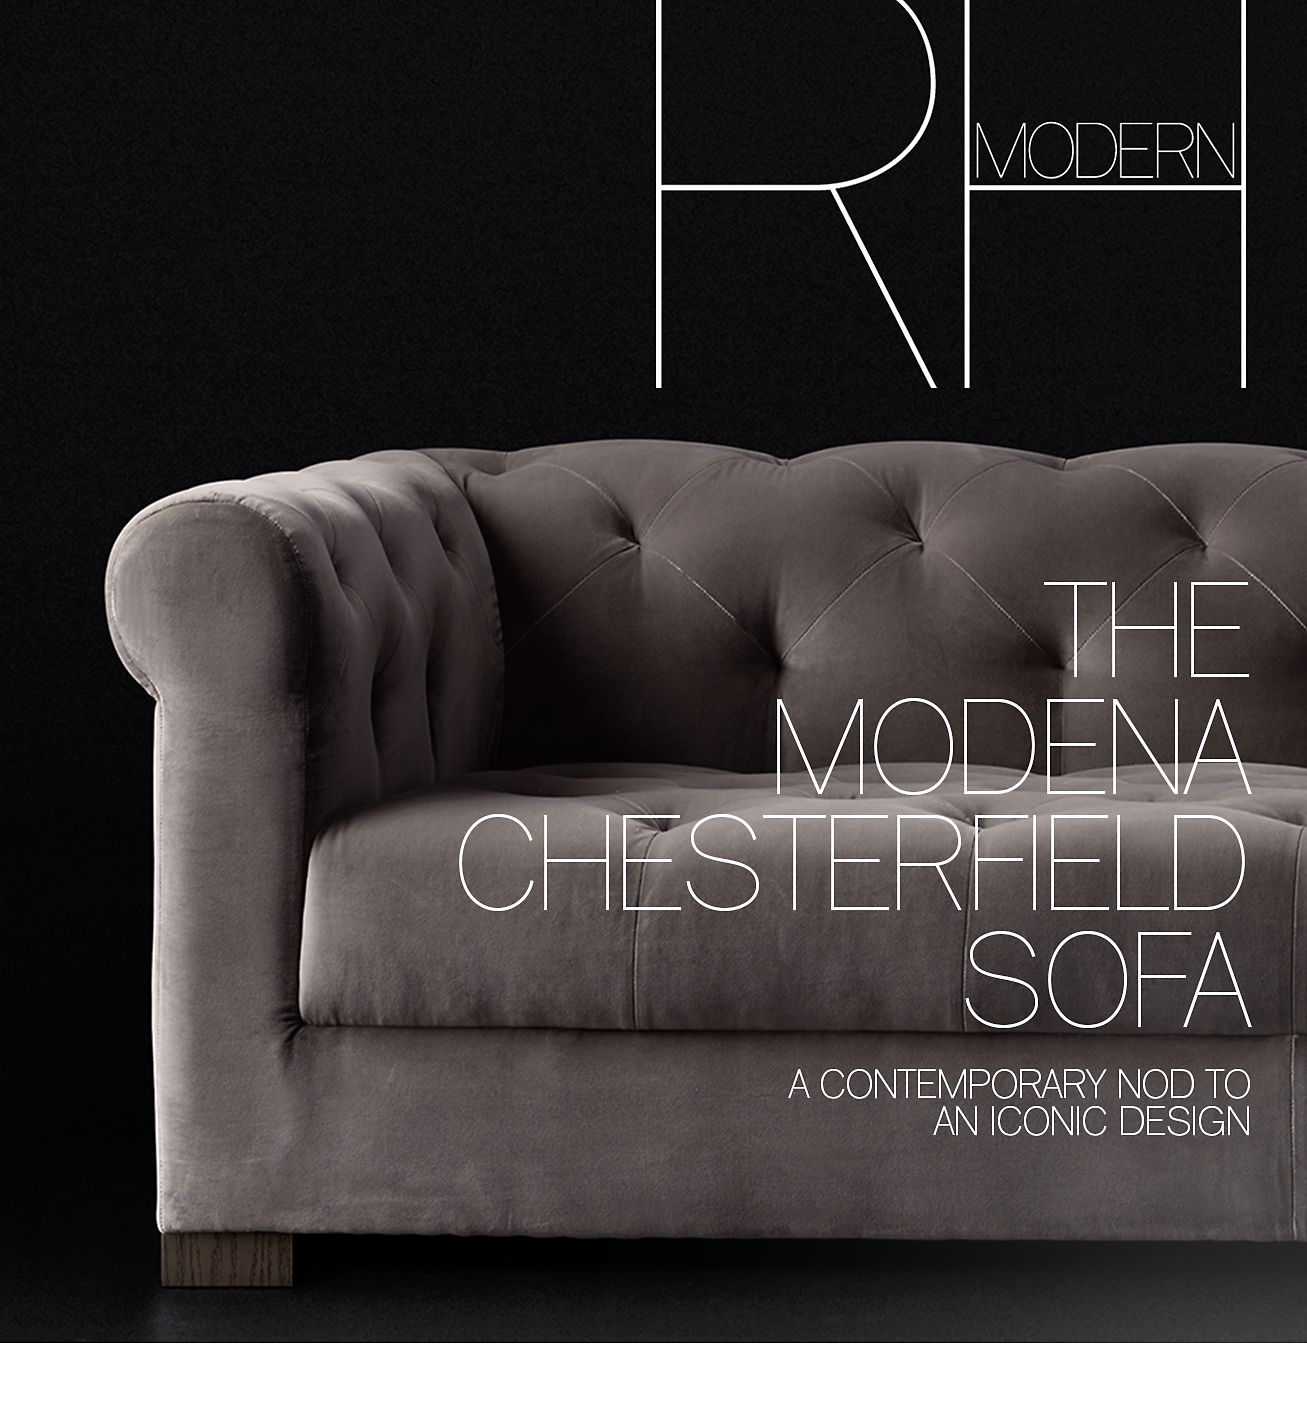 Wonderbaarlijk Restoration Hardware: Explore the Modena Chesterfield Sofa & the WL-61